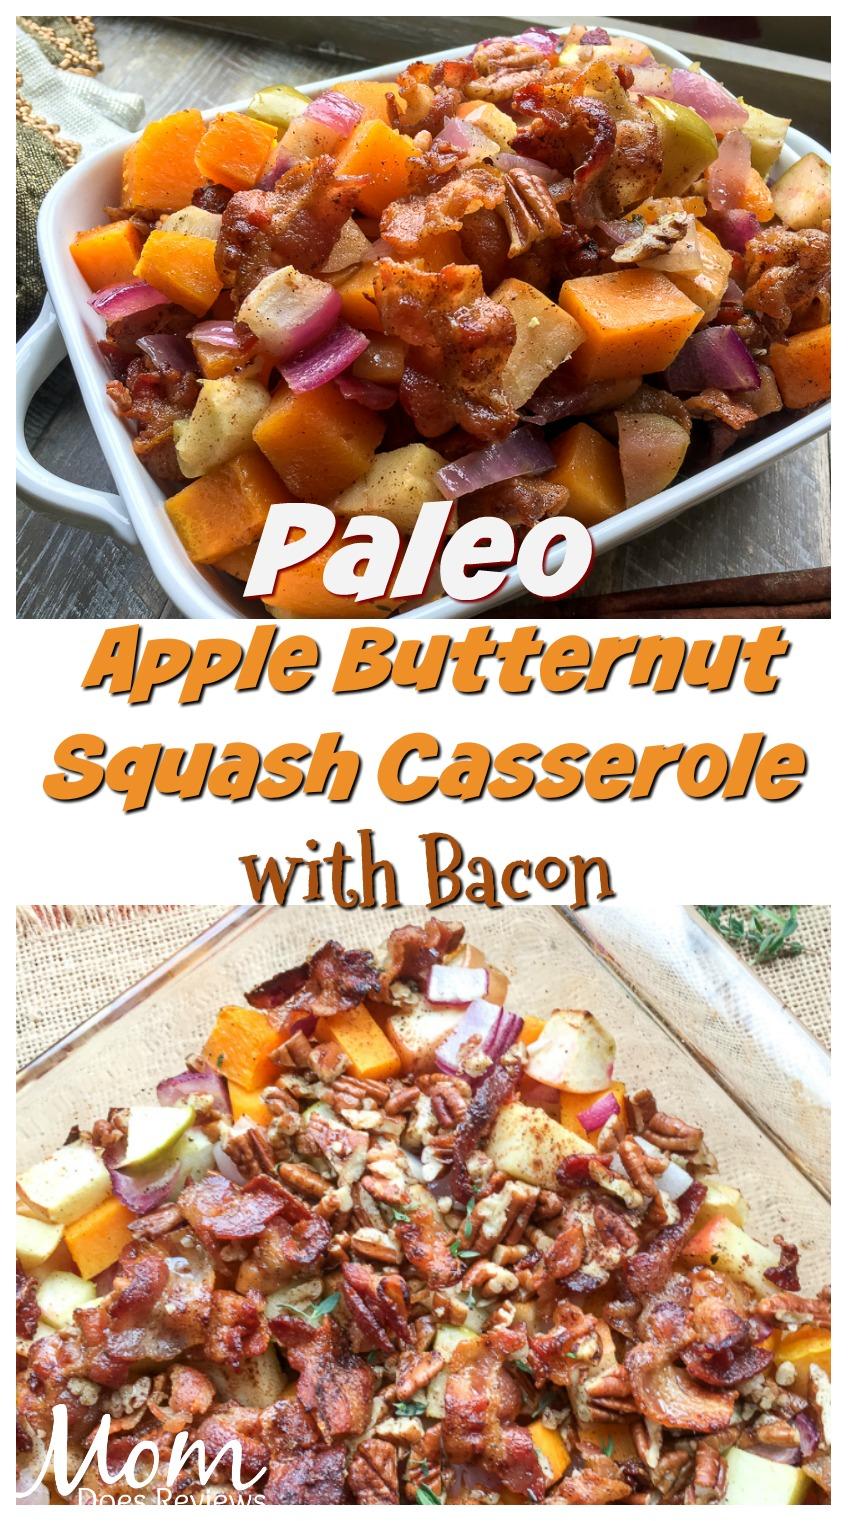 Paleo Apple Butternut Squash Casserole with Bacon-Pecan Topping #paleo #food #recipe #butternut #bacon #casserole